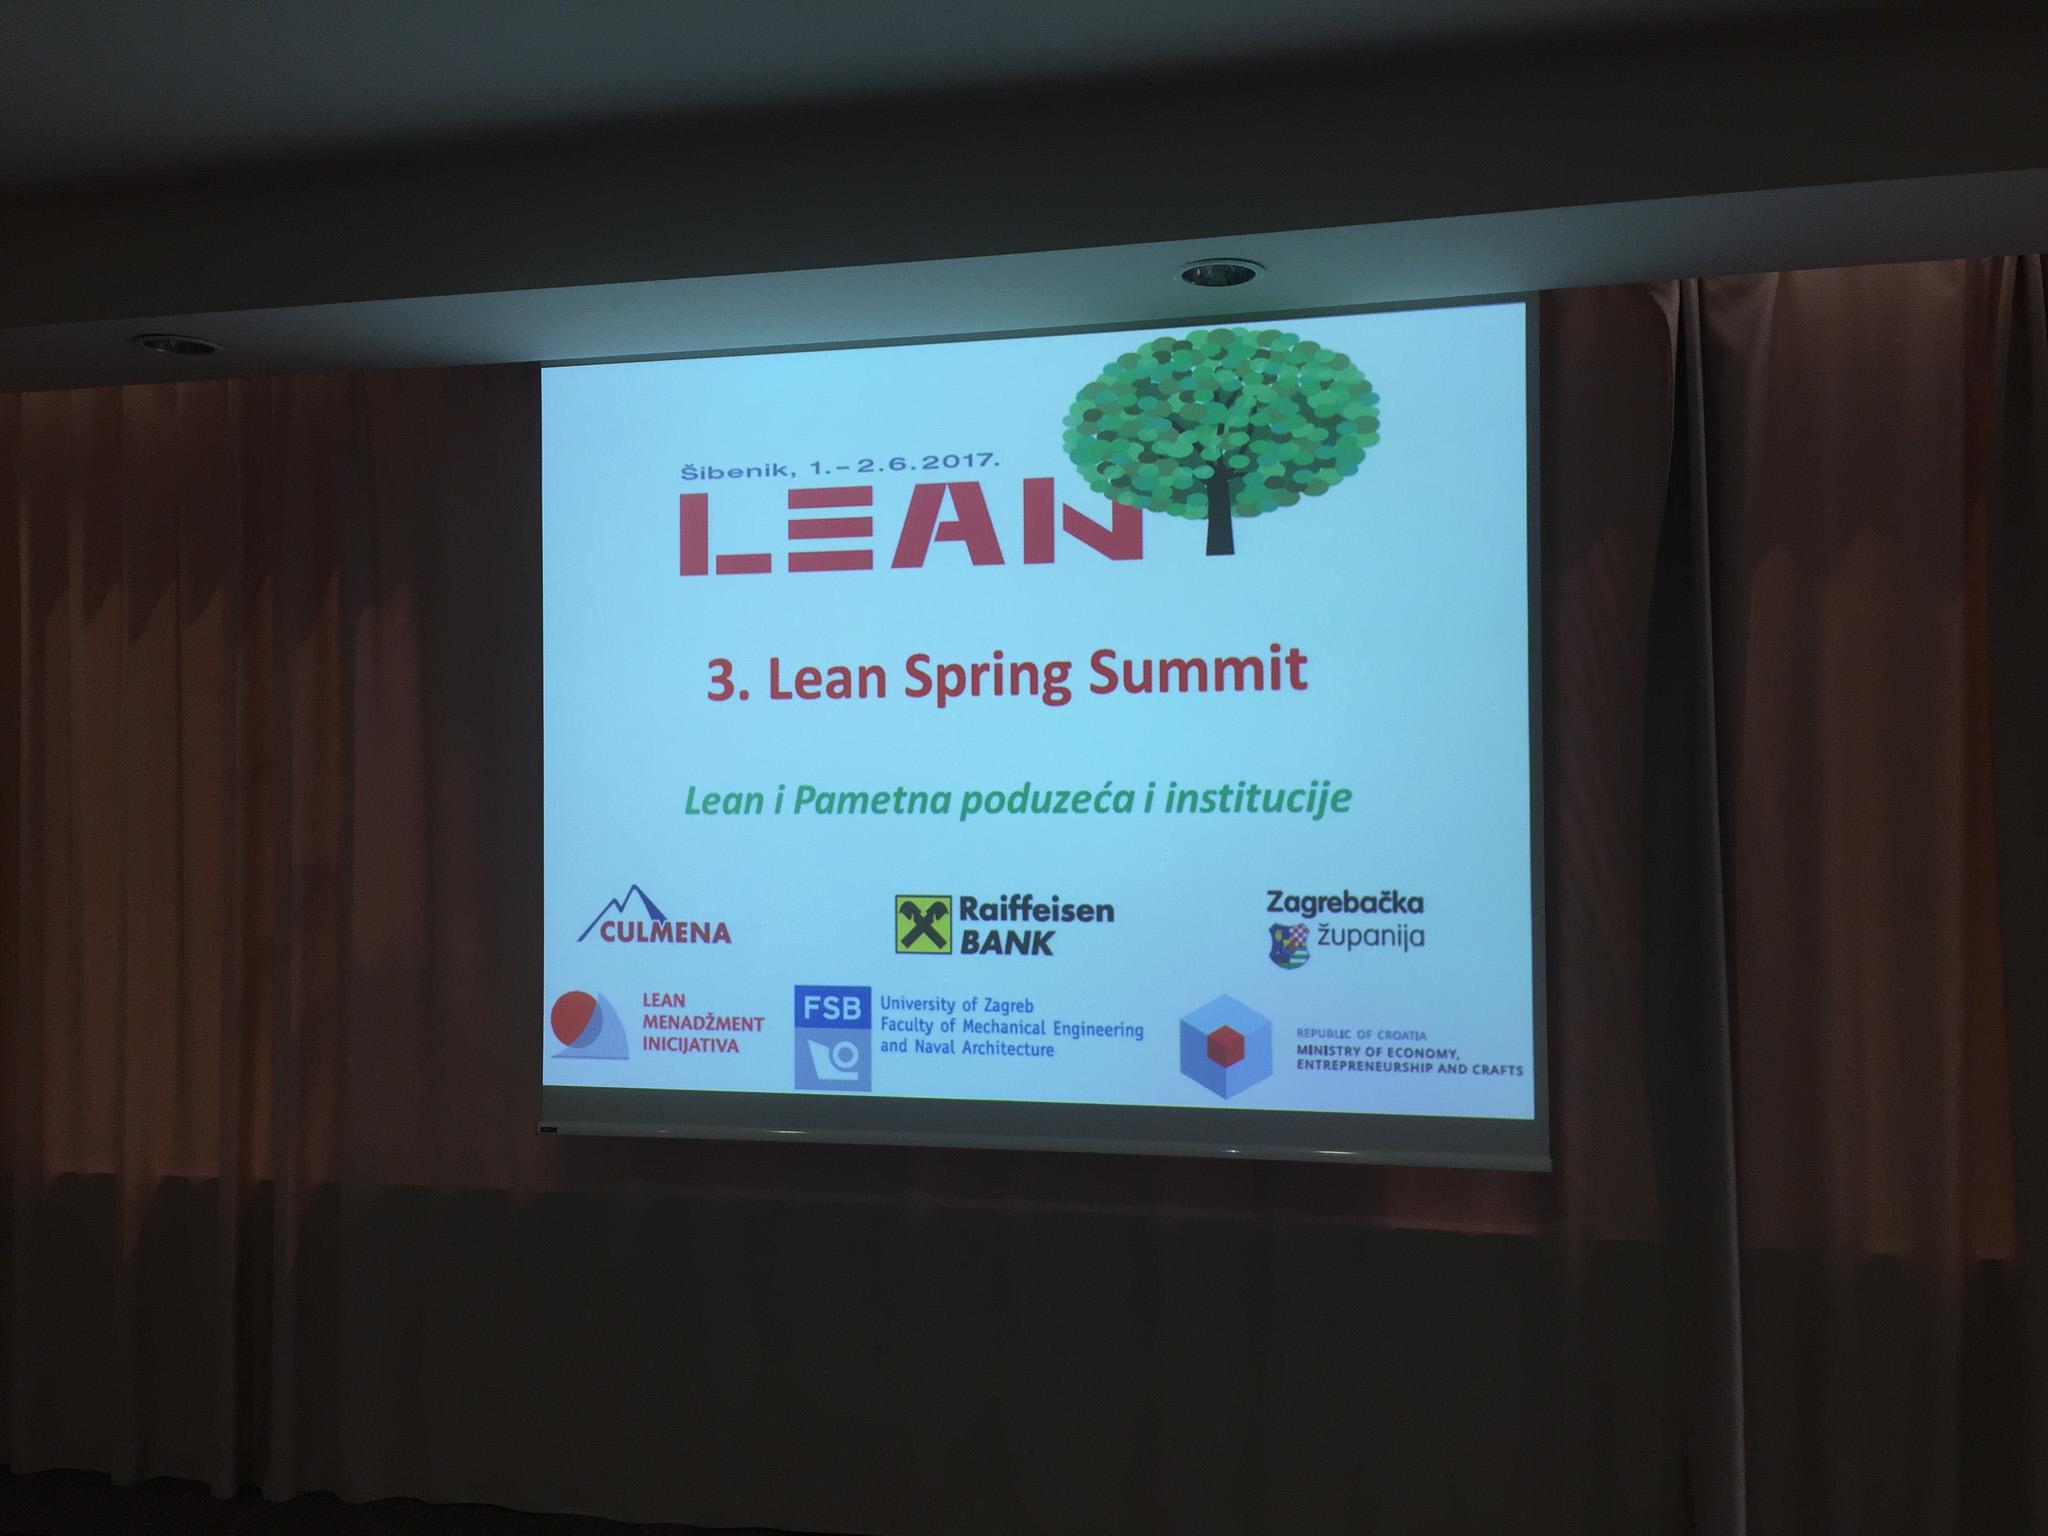 Lean Spring Summit 2017